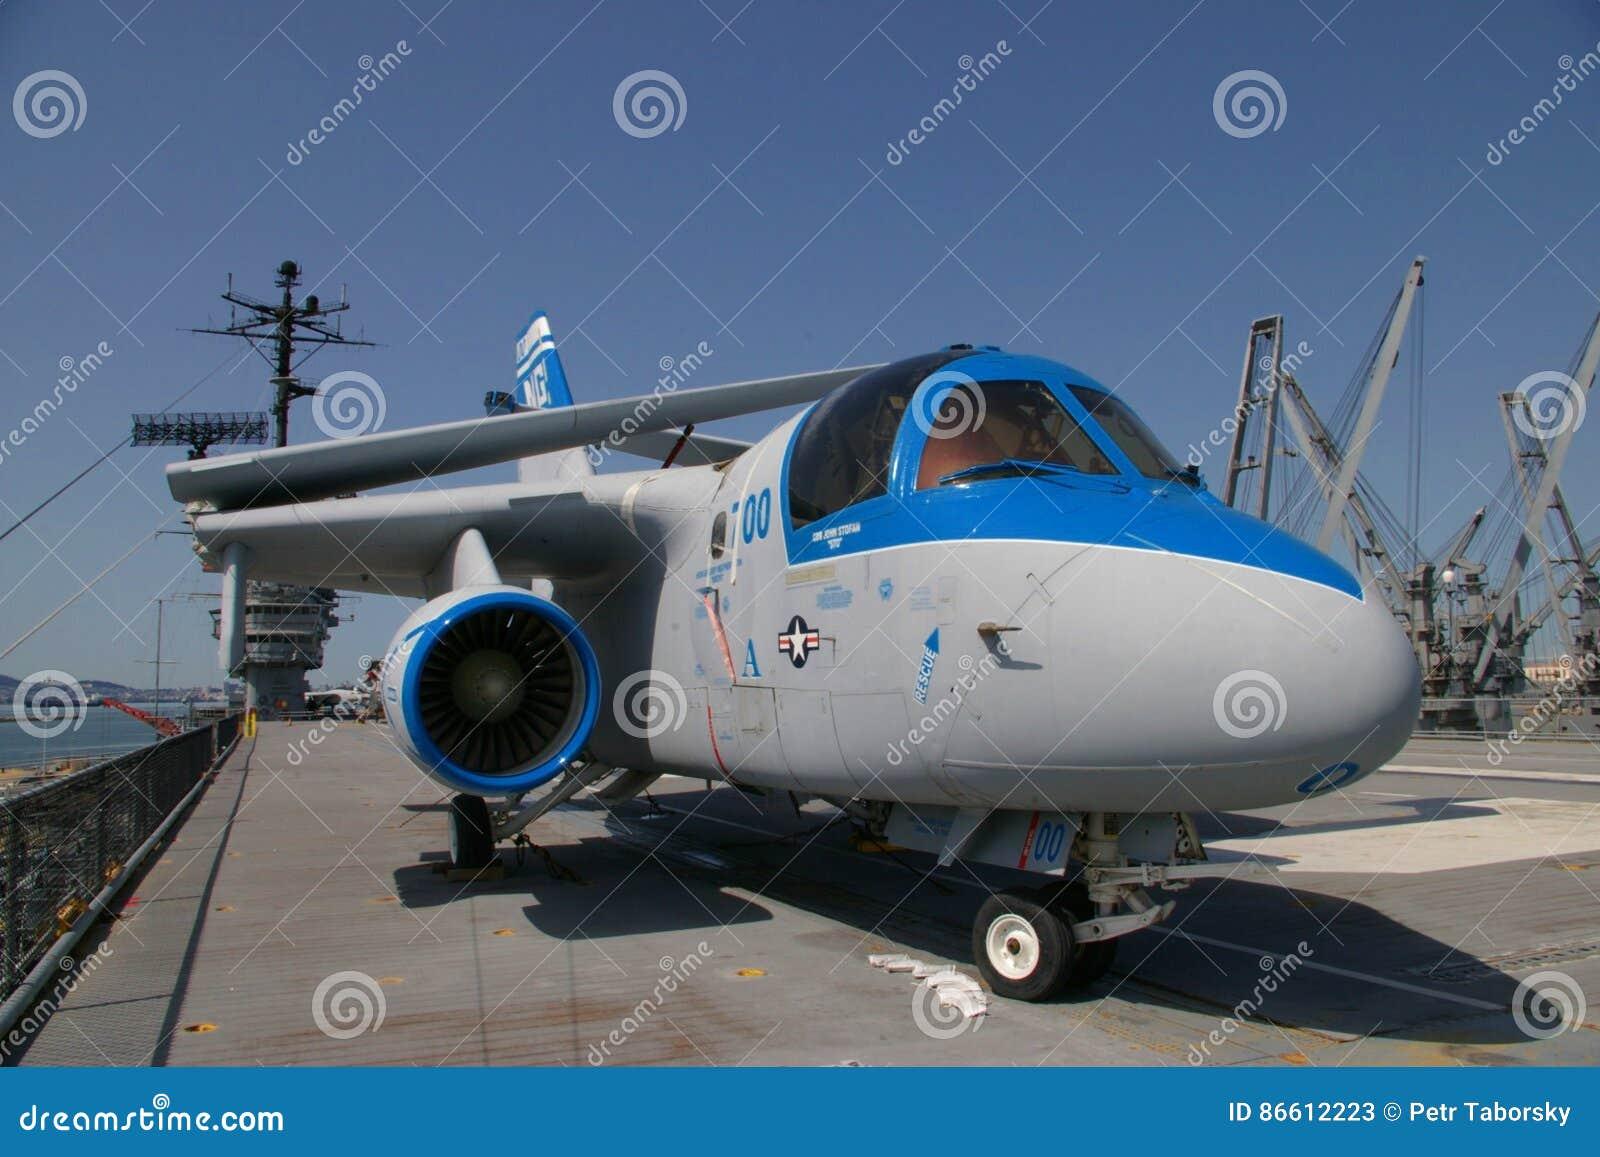 ALAMEDA, США - 23-ЬЕ МАРТА 2010: S-3 Викинг, шершень авианосца в Alameda, США 23-его марта 2010